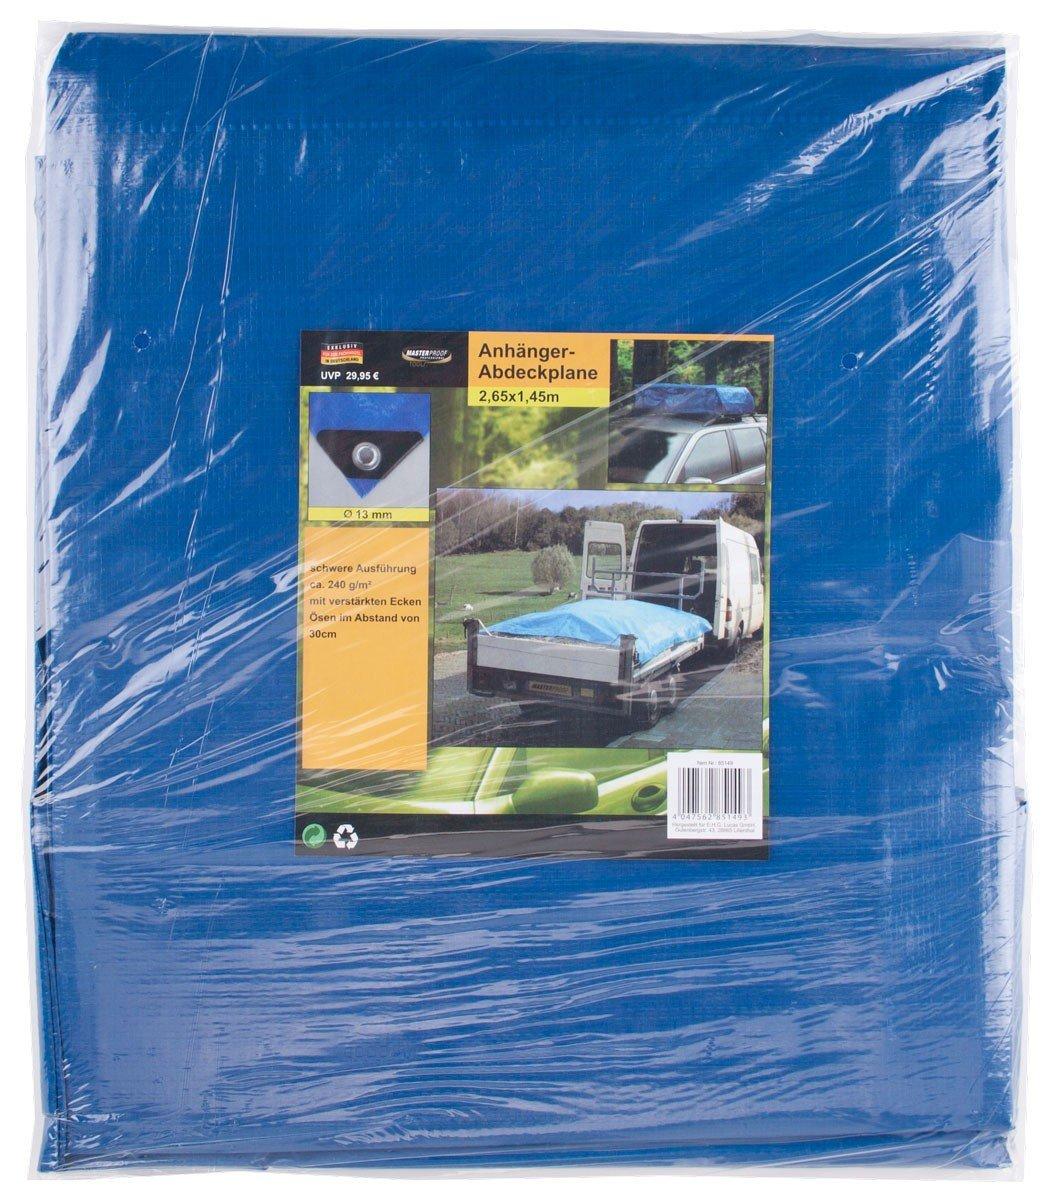 Masterproof - Lona para remolques, 3,15 x 1,65 m, color azul EHG Lucas